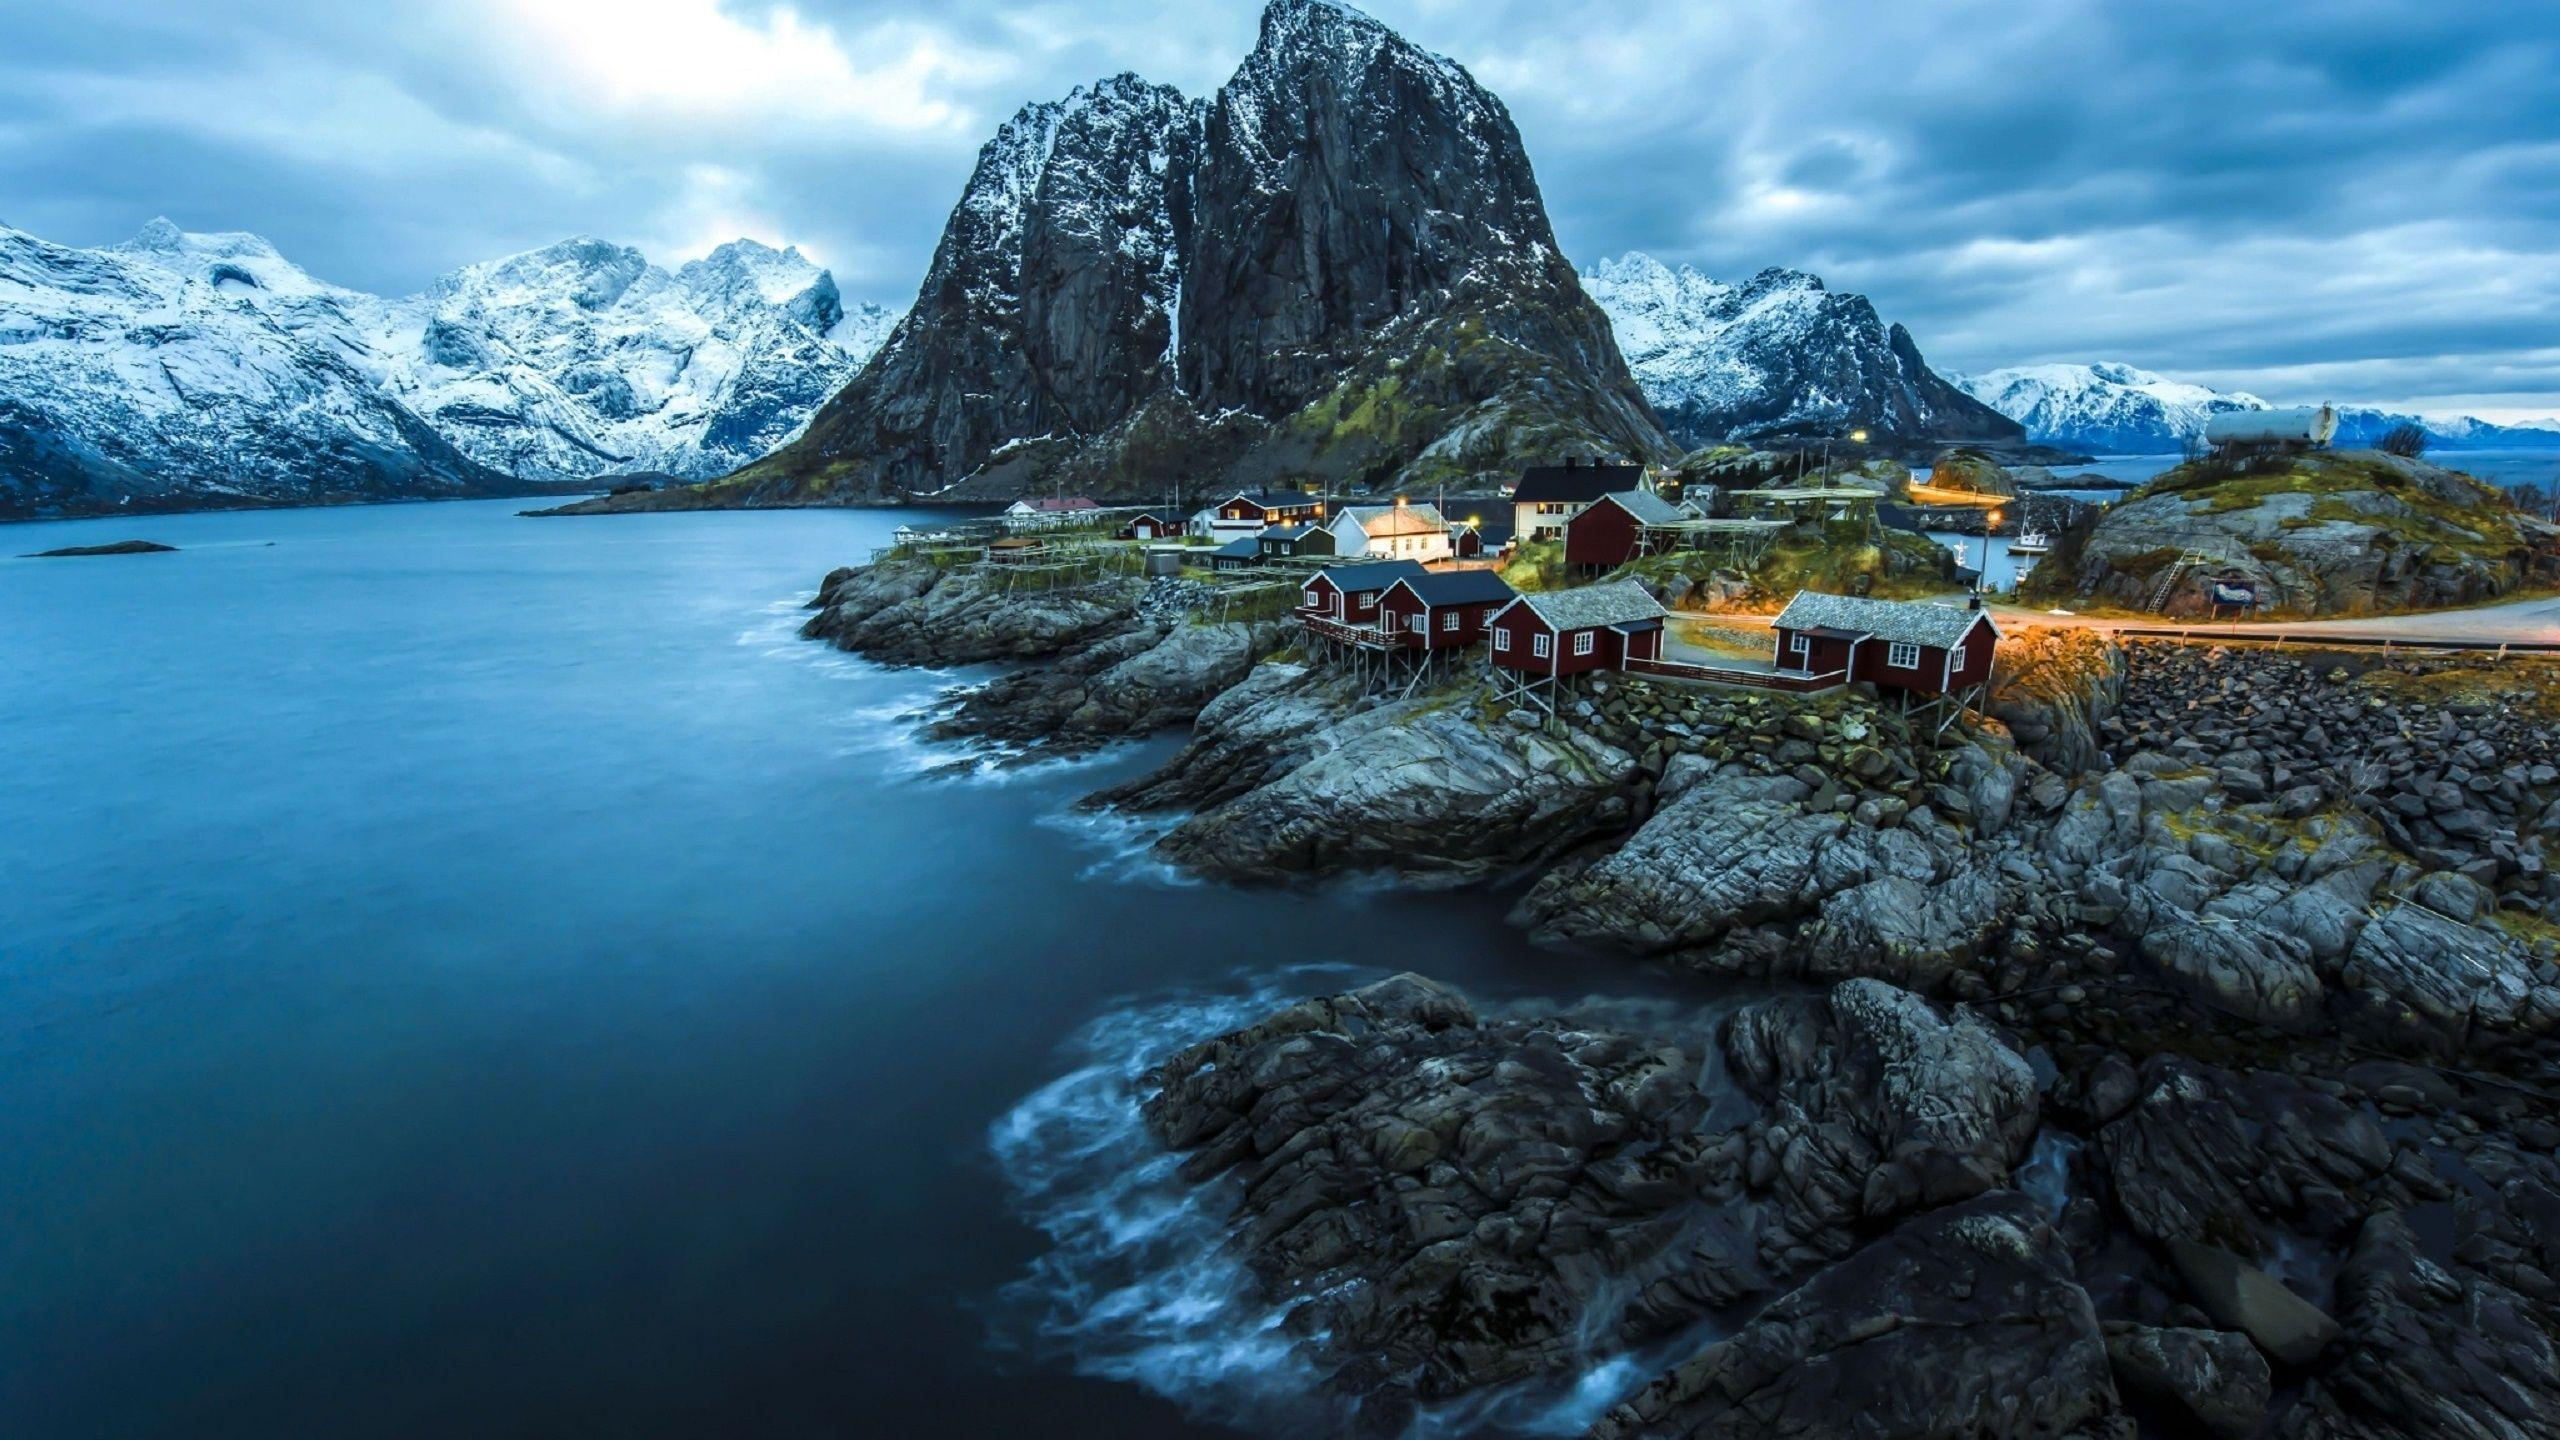 Norway Wallpapers Wallpaper Cave